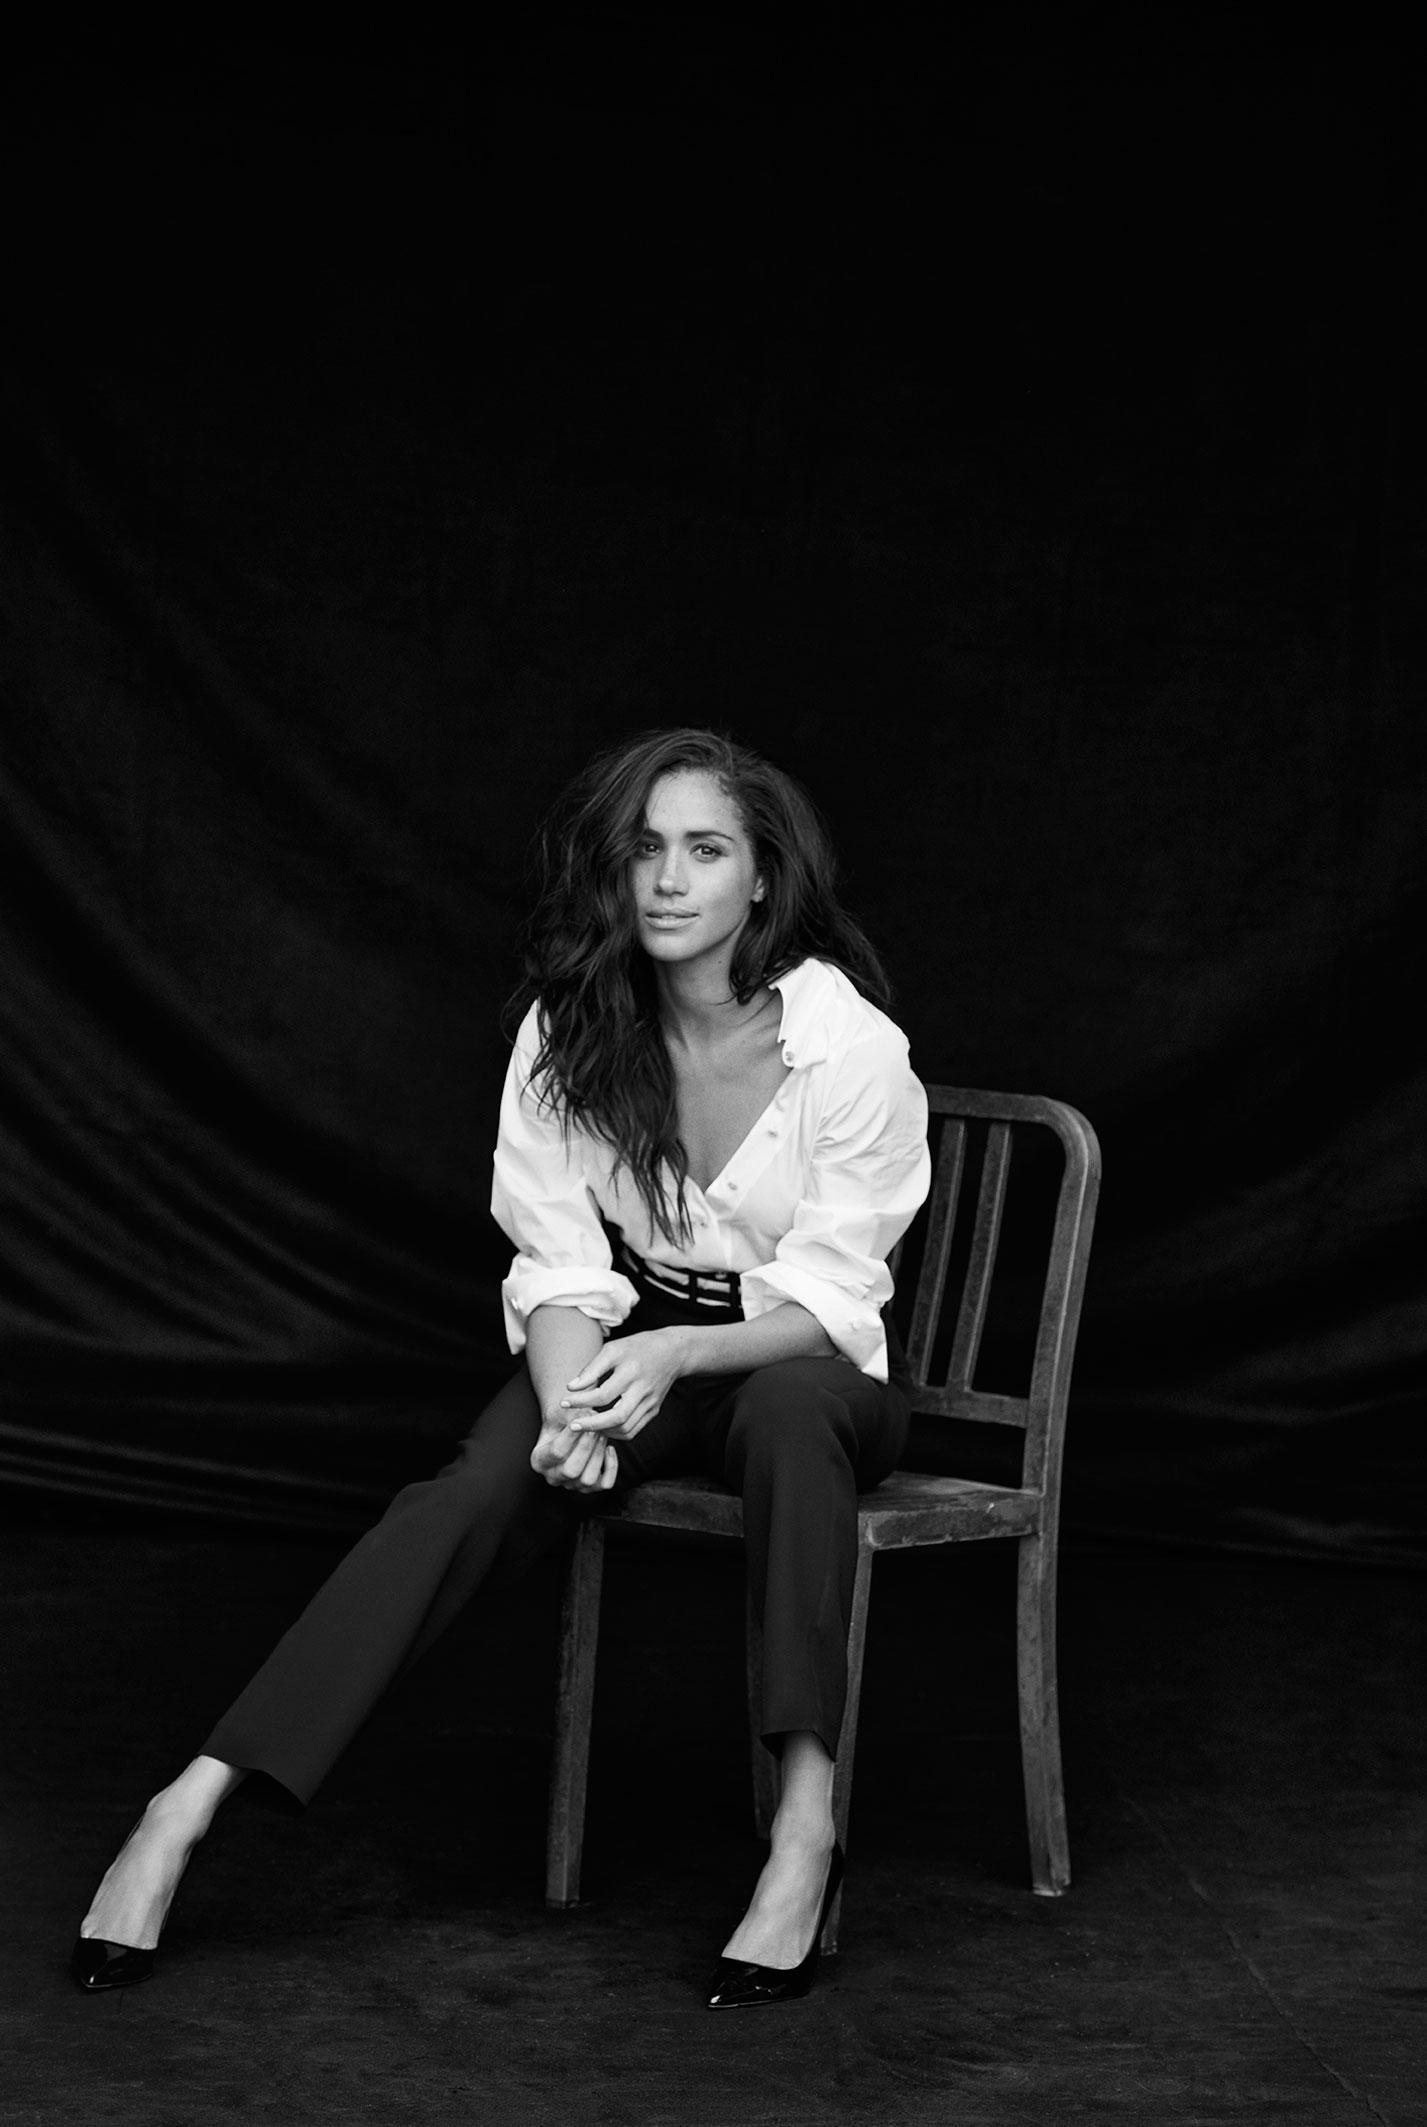 Меган Маркл на страницах журнала Vanity Fair / фото 04